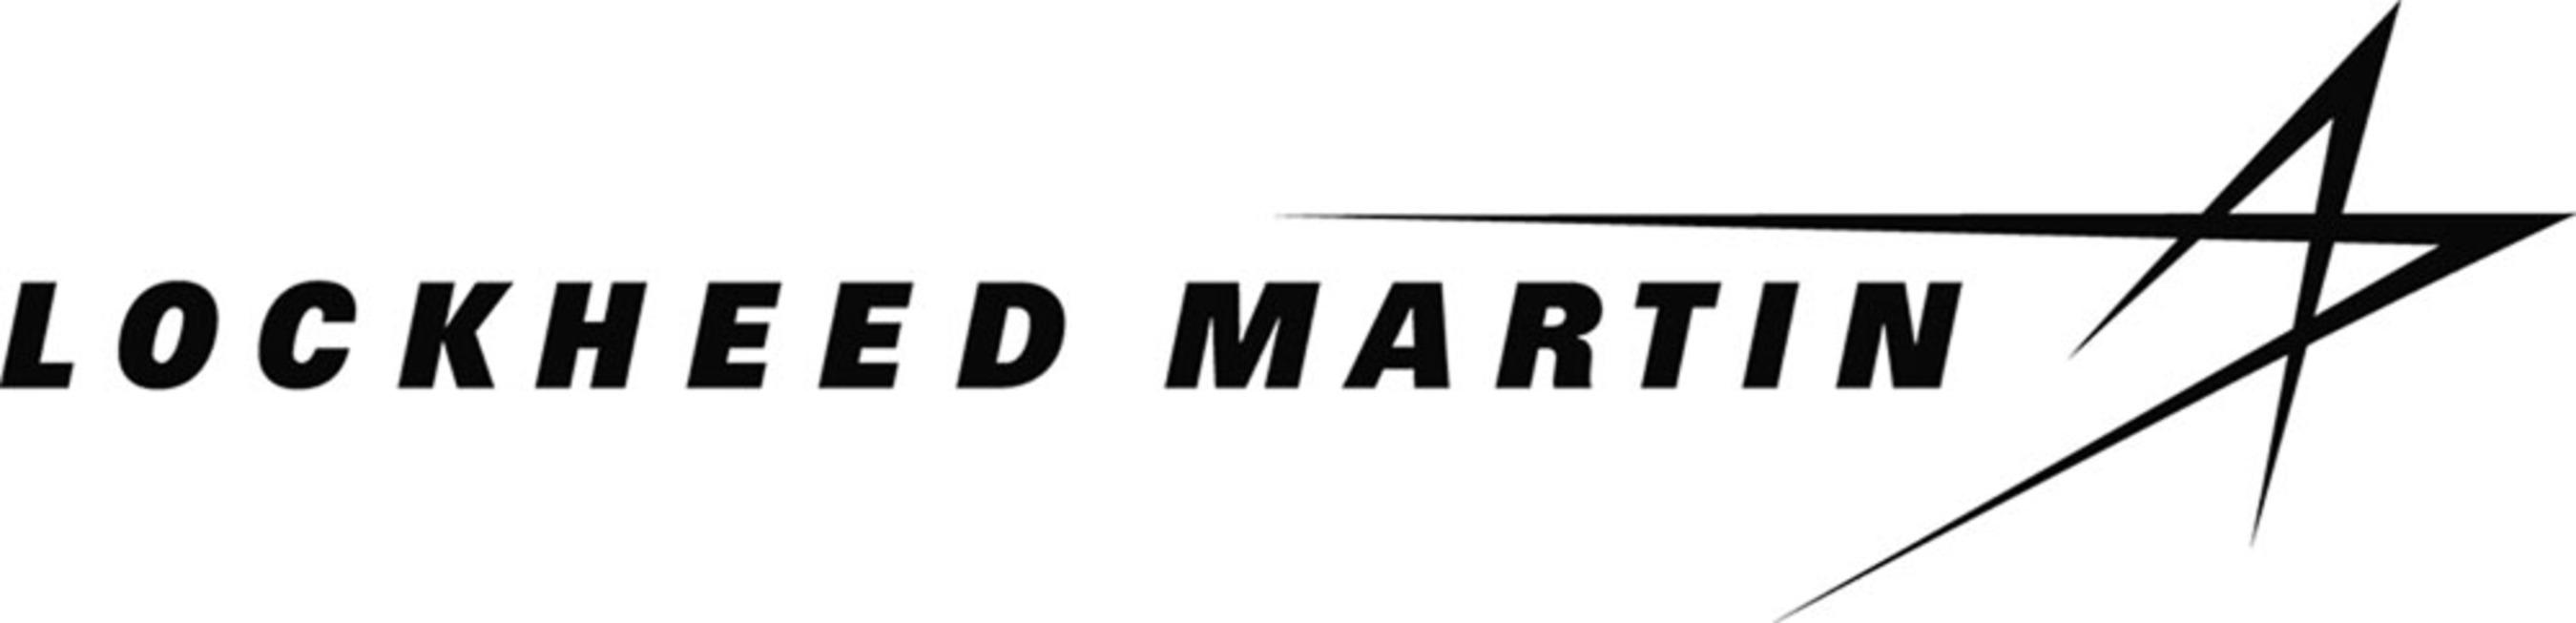 Lockheed Martin Corporation.